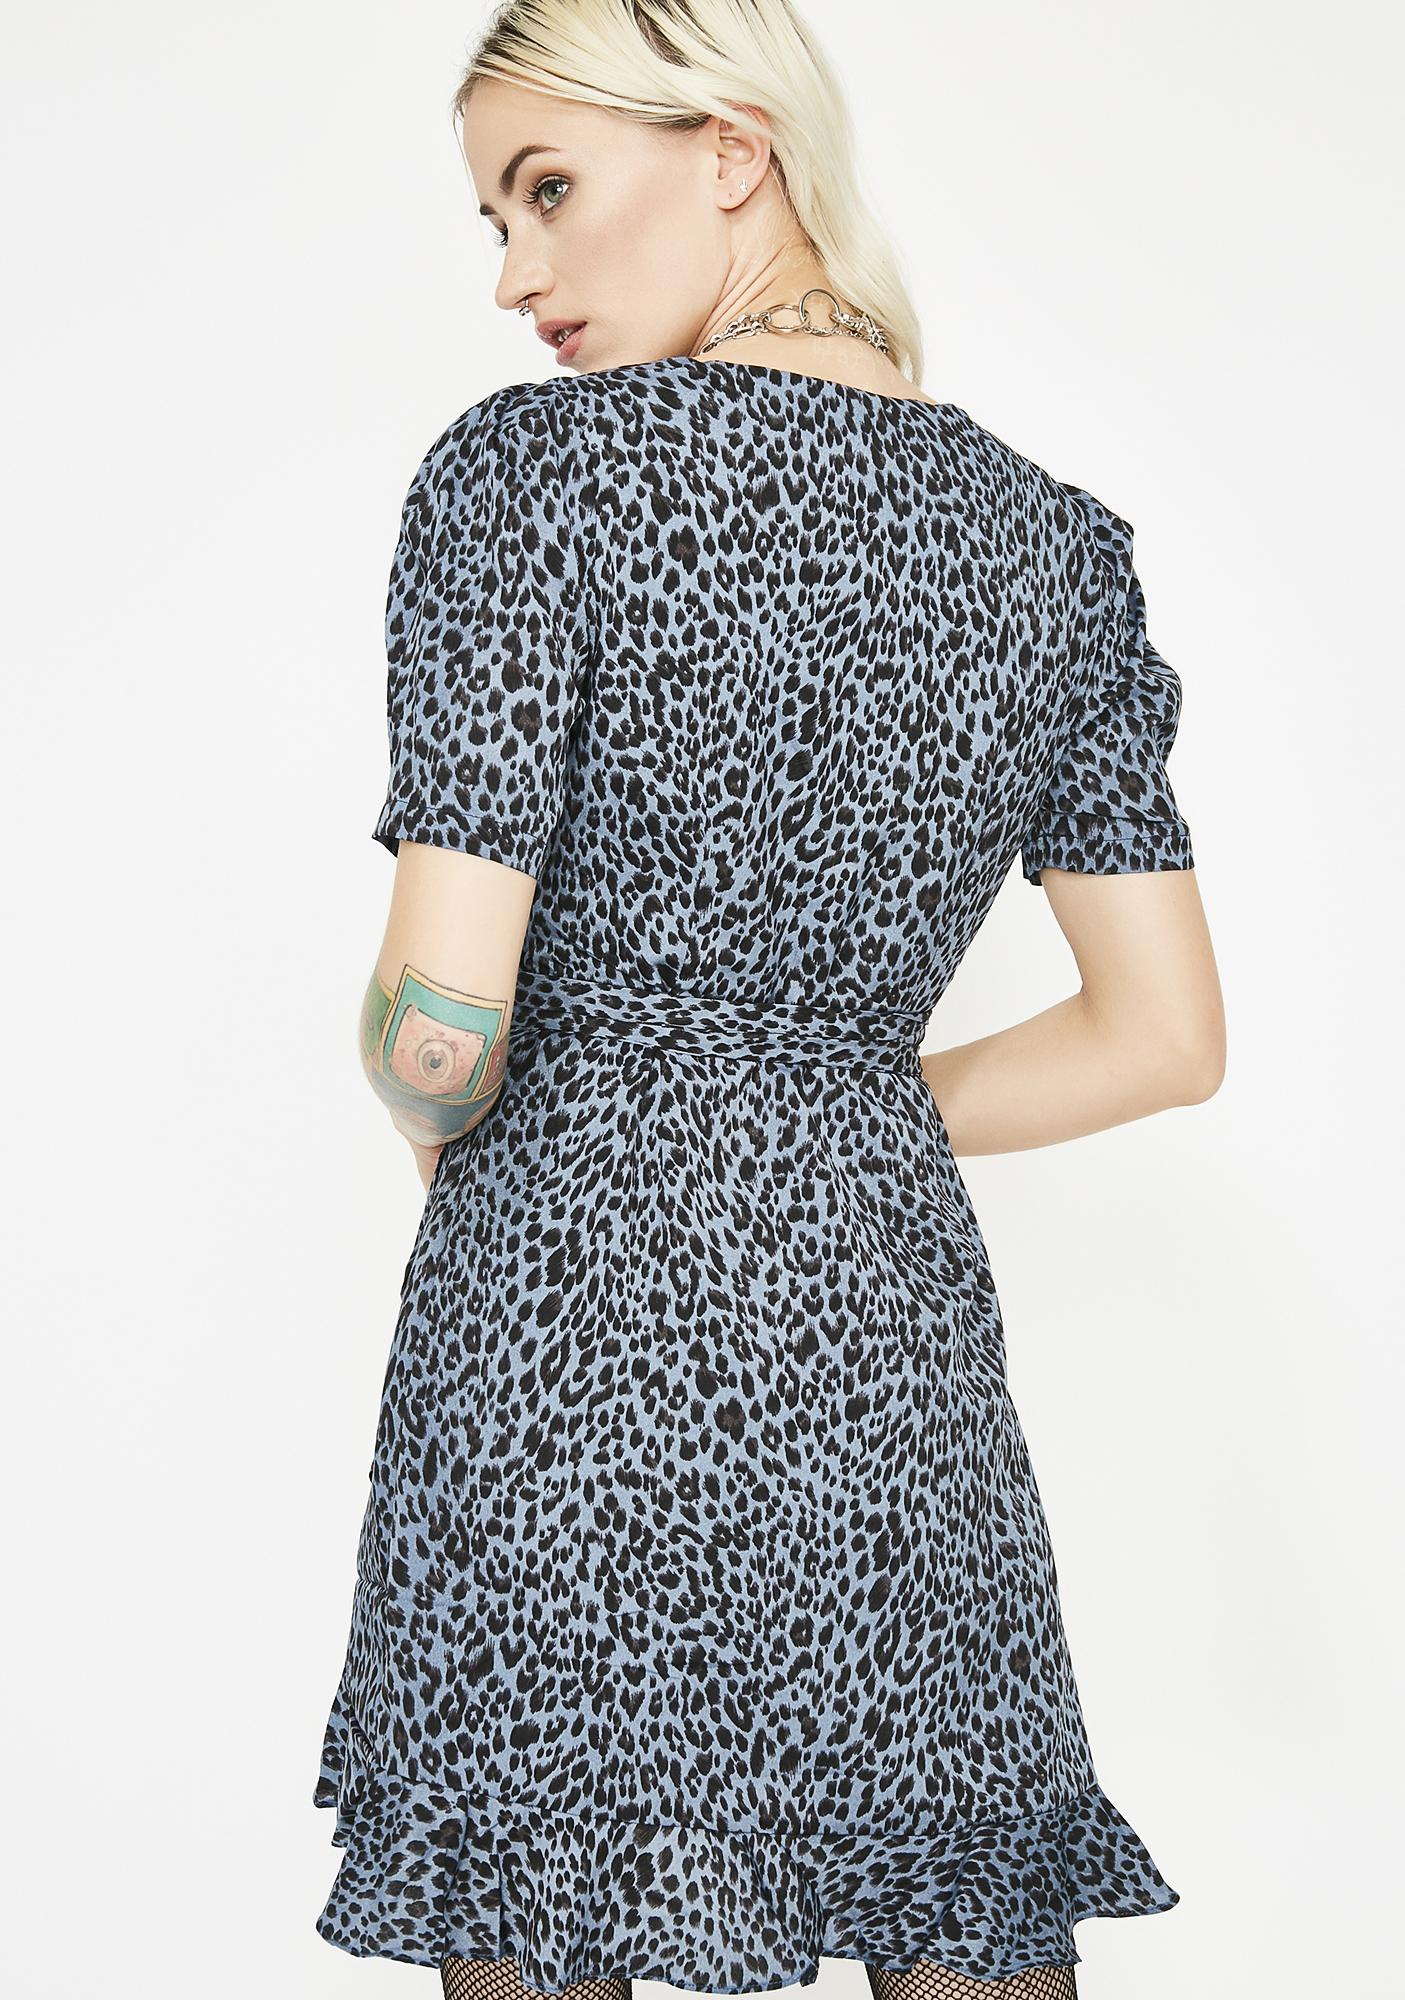 Sky Cheetah Cheata Mini Dress